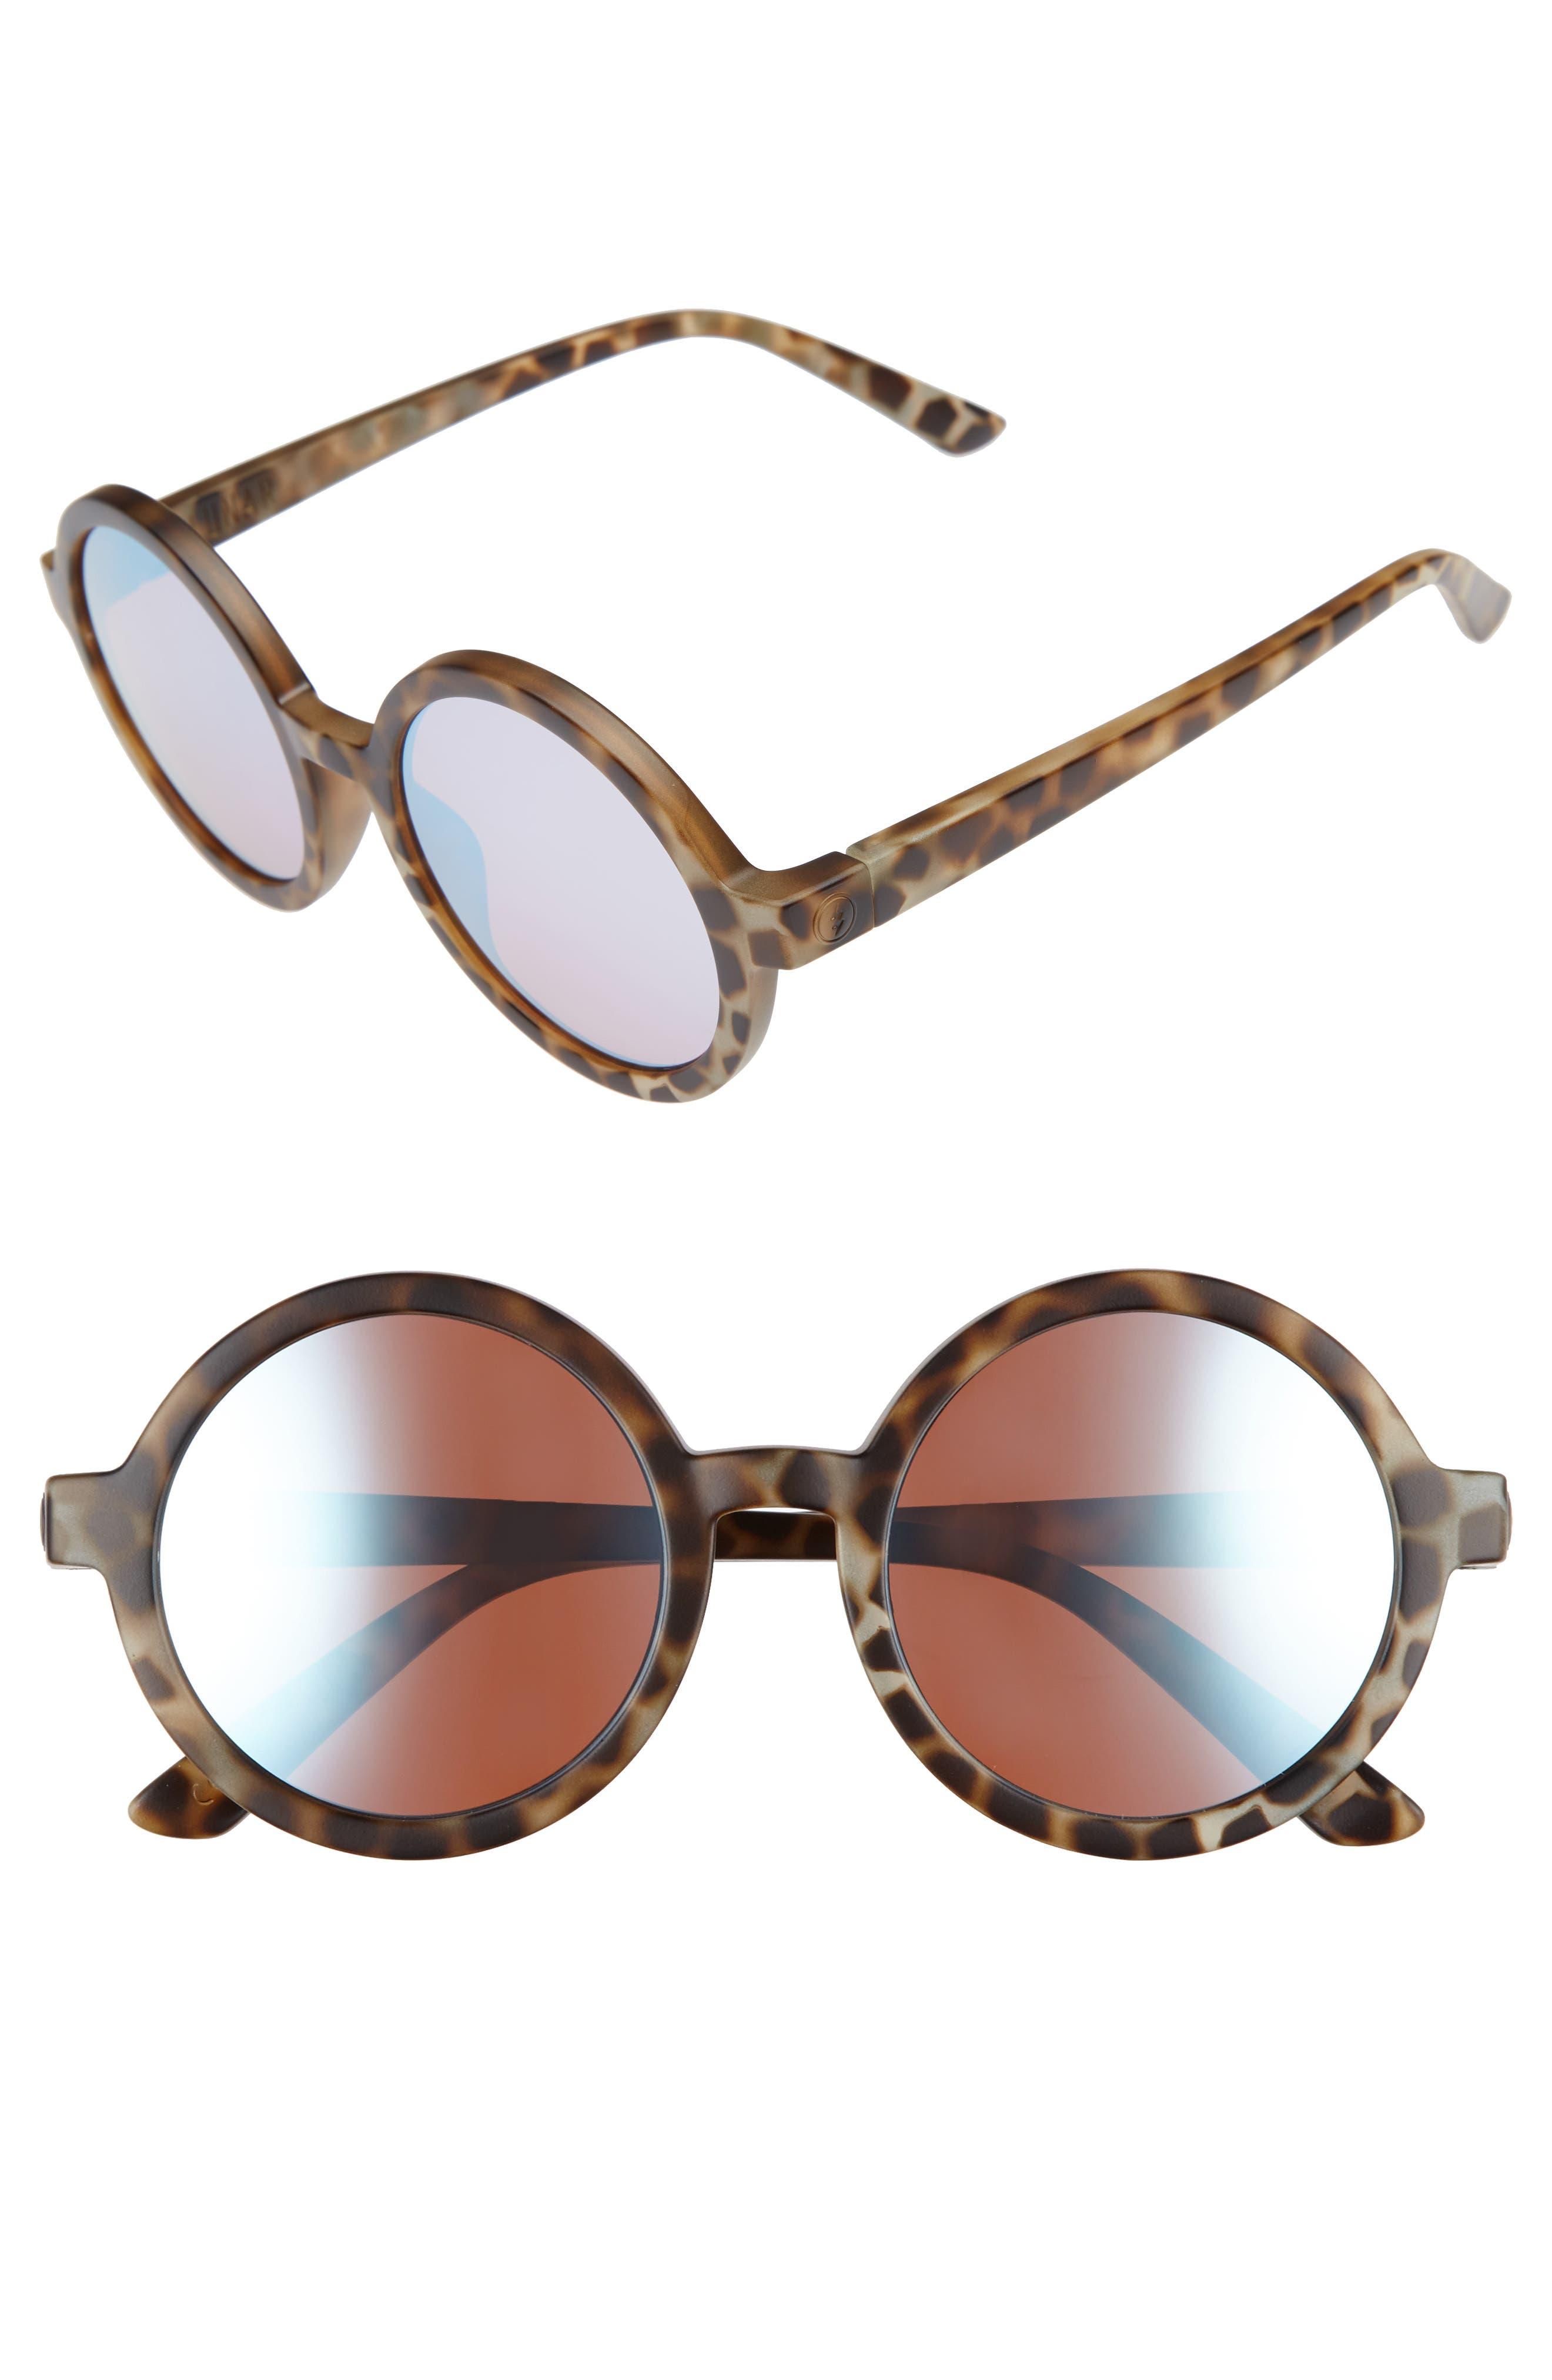 Lunar 52mm Round Sunglasses,                             Main thumbnail 1, color,                             250